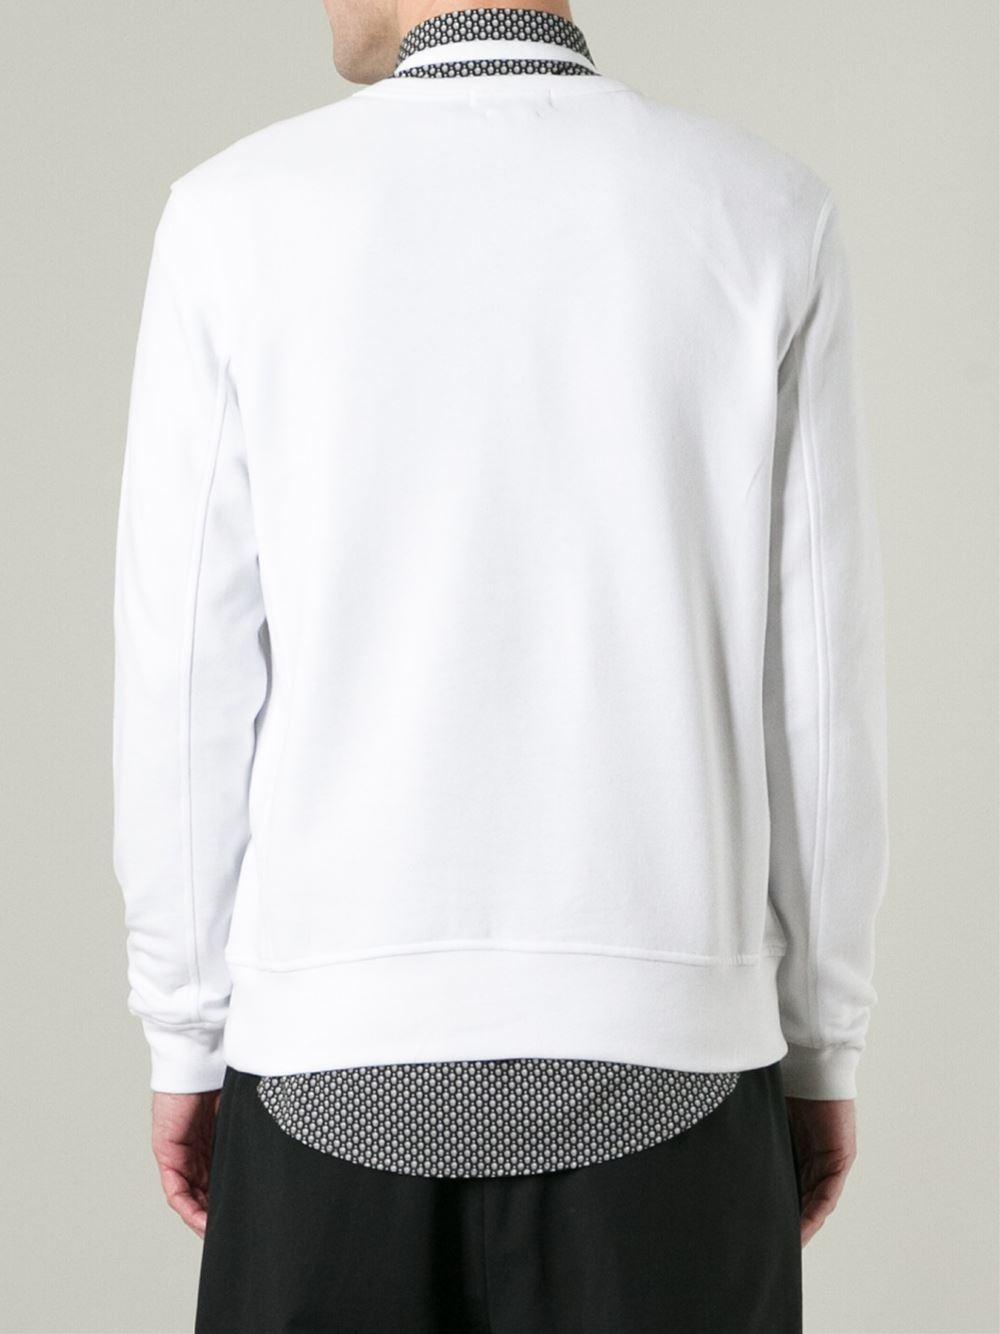 alexander mcqueen feather sweatshirt in white for men lyst. Black Bedroom Furniture Sets. Home Design Ideas